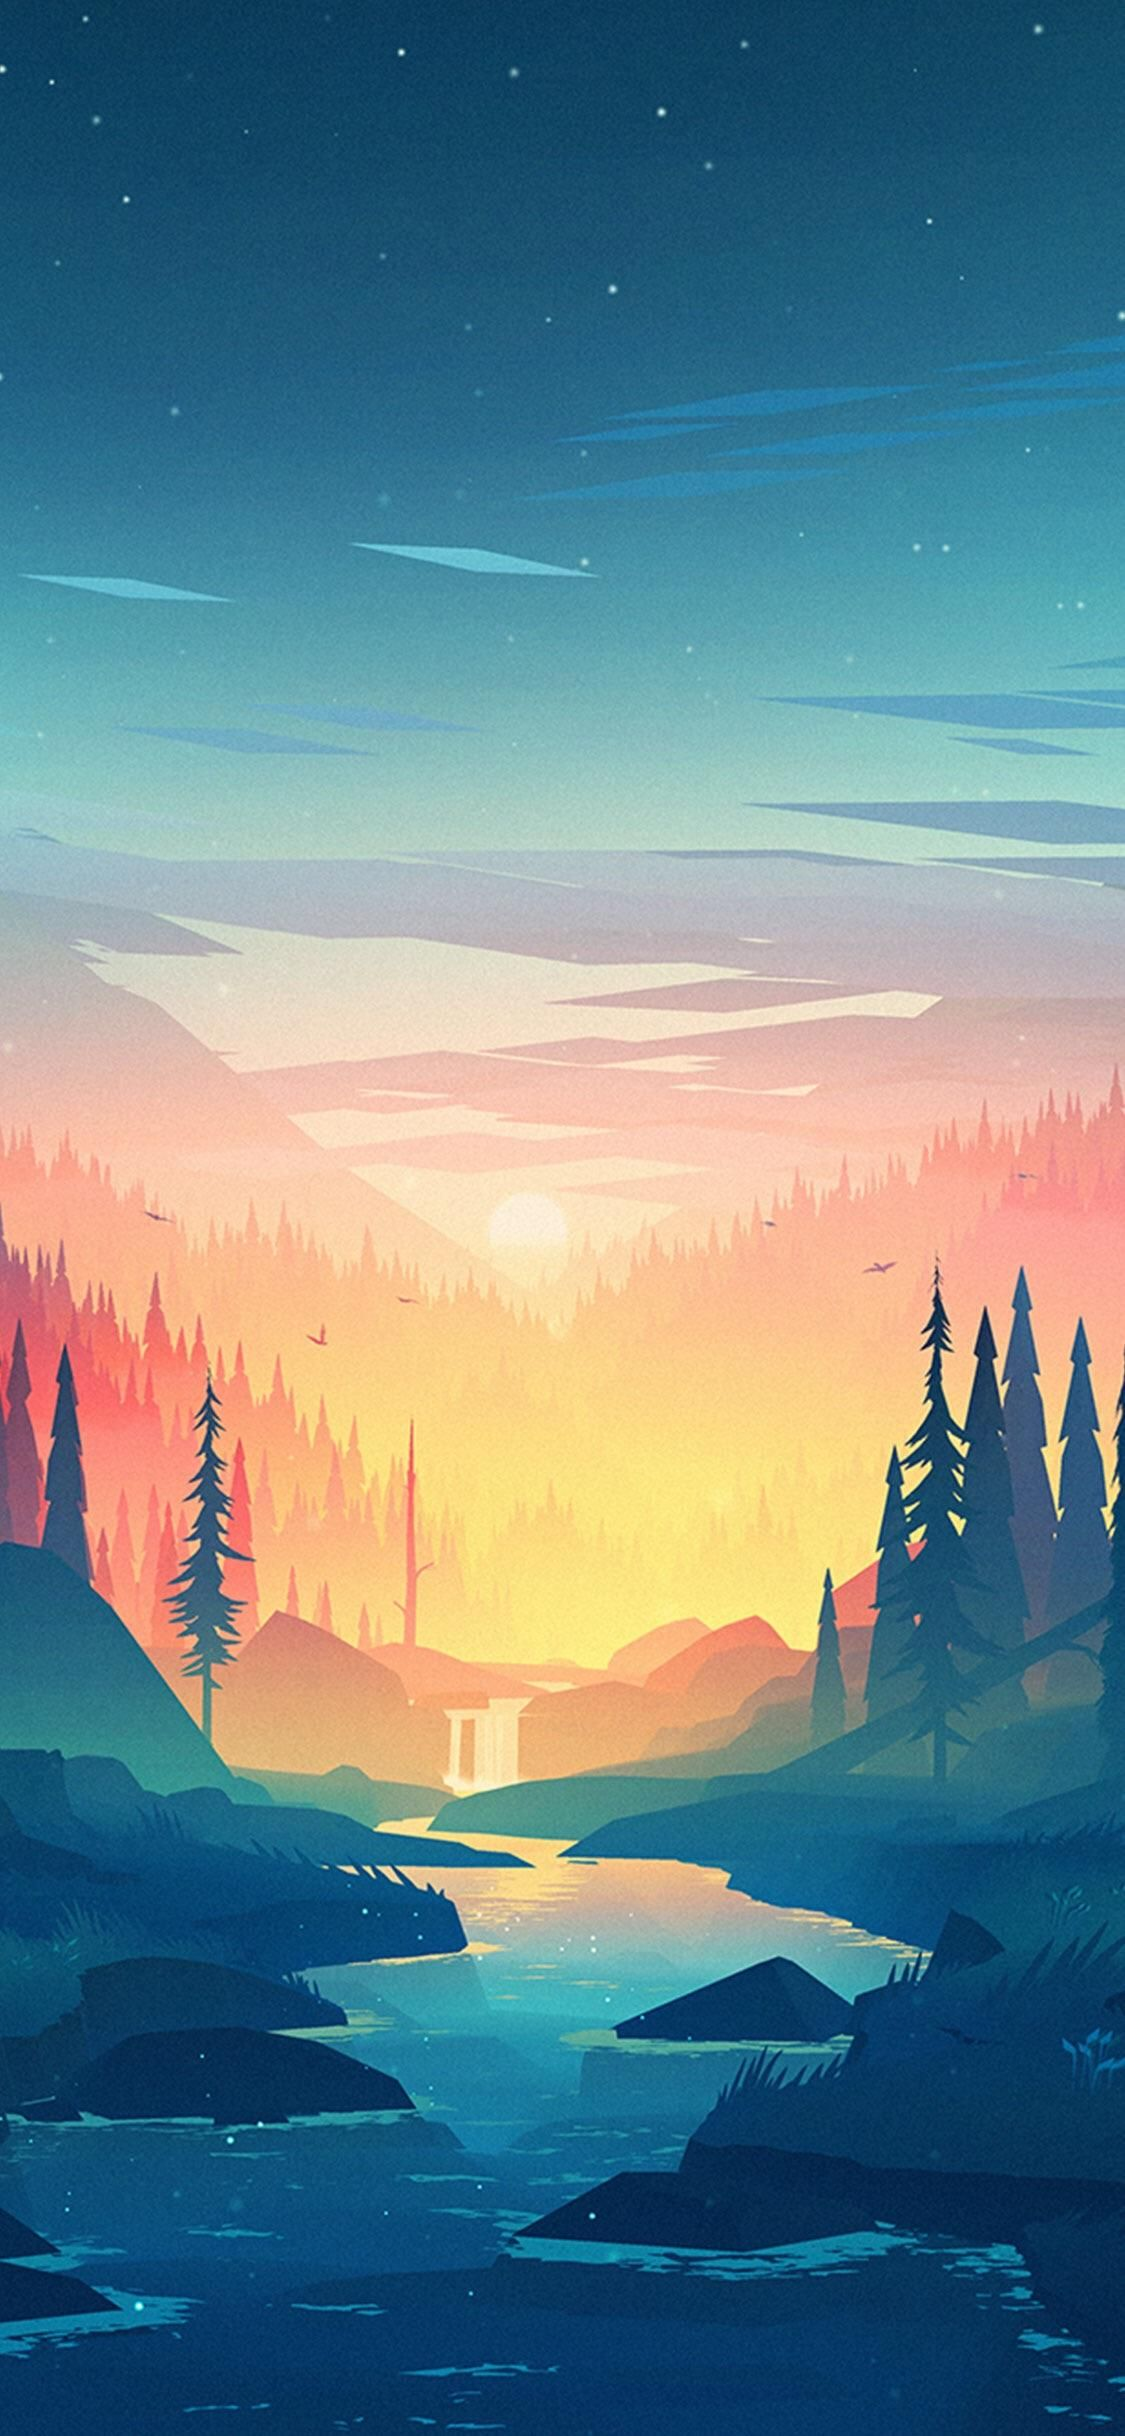 Pin By Bimarq Studios On Fondos Tumblr Landscape Wallpaper Beautiful Landscape Wallpaper Nature Wallpaper